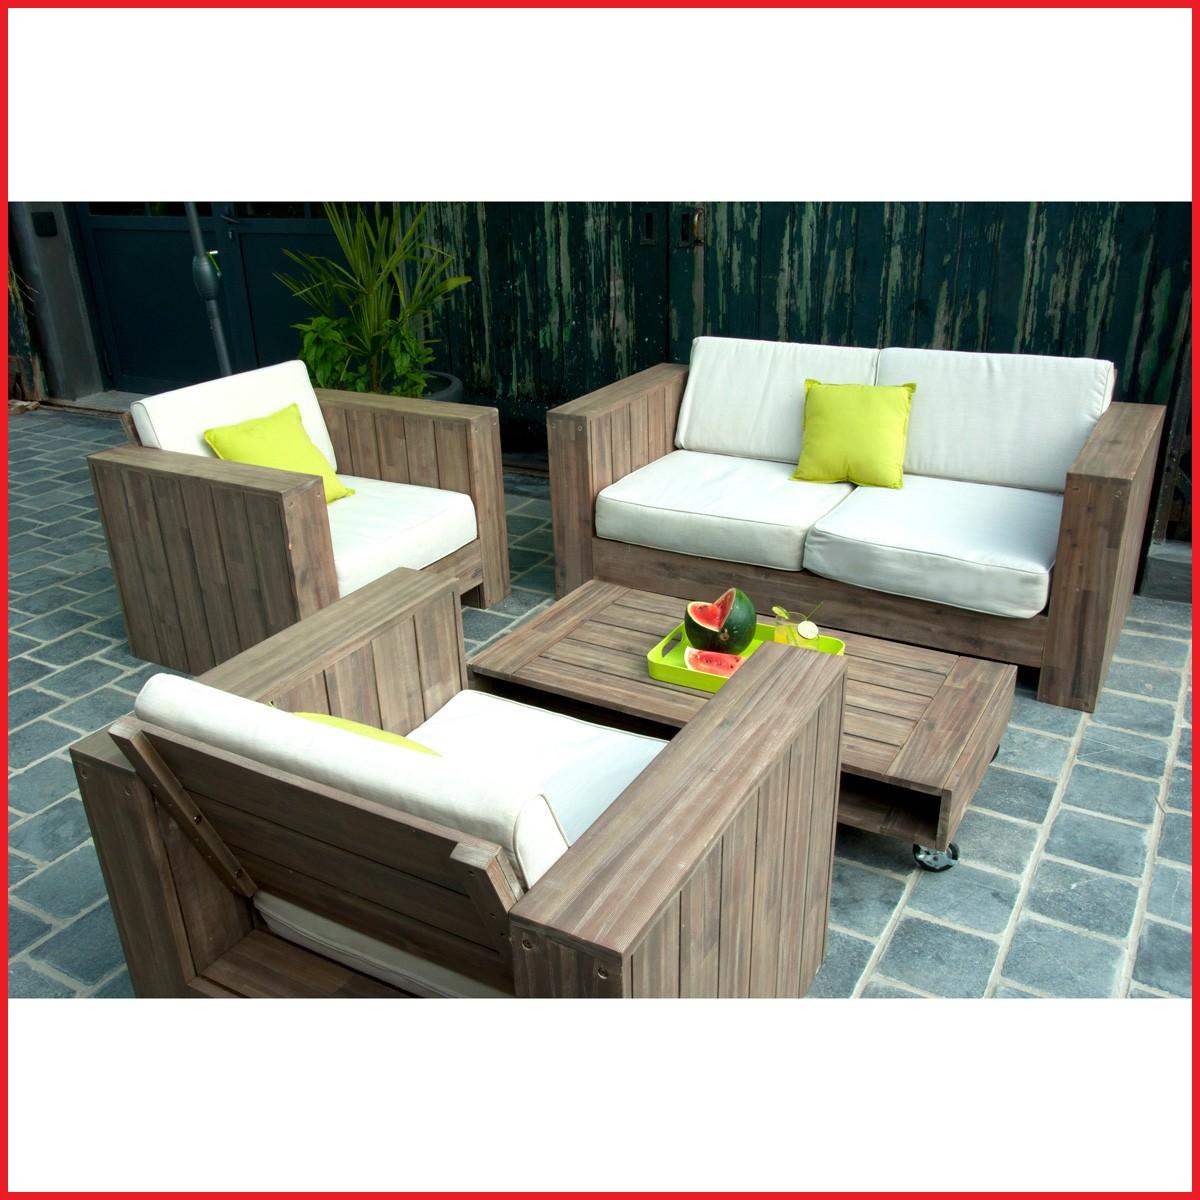 petit salon de jardin bois pas cher abri de jardin et. Black Bedroom Furniture Sets. Home Design Ideas